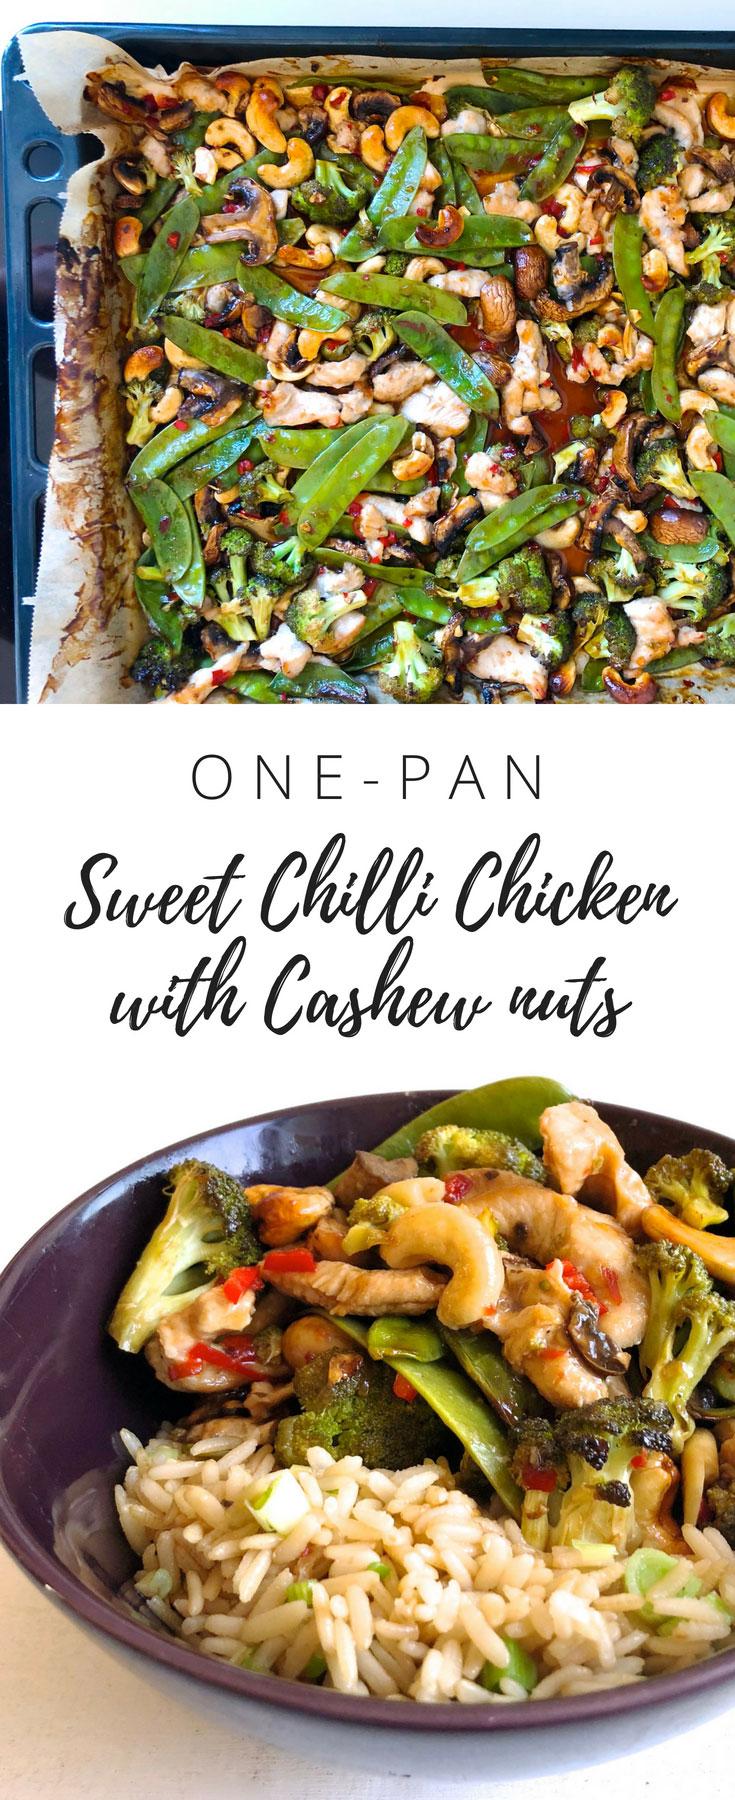 One+pan+Sweet+Chilli+Chicken+with+Cashew+nuts+Recipe+-+Lyndi+Cohen.jpg